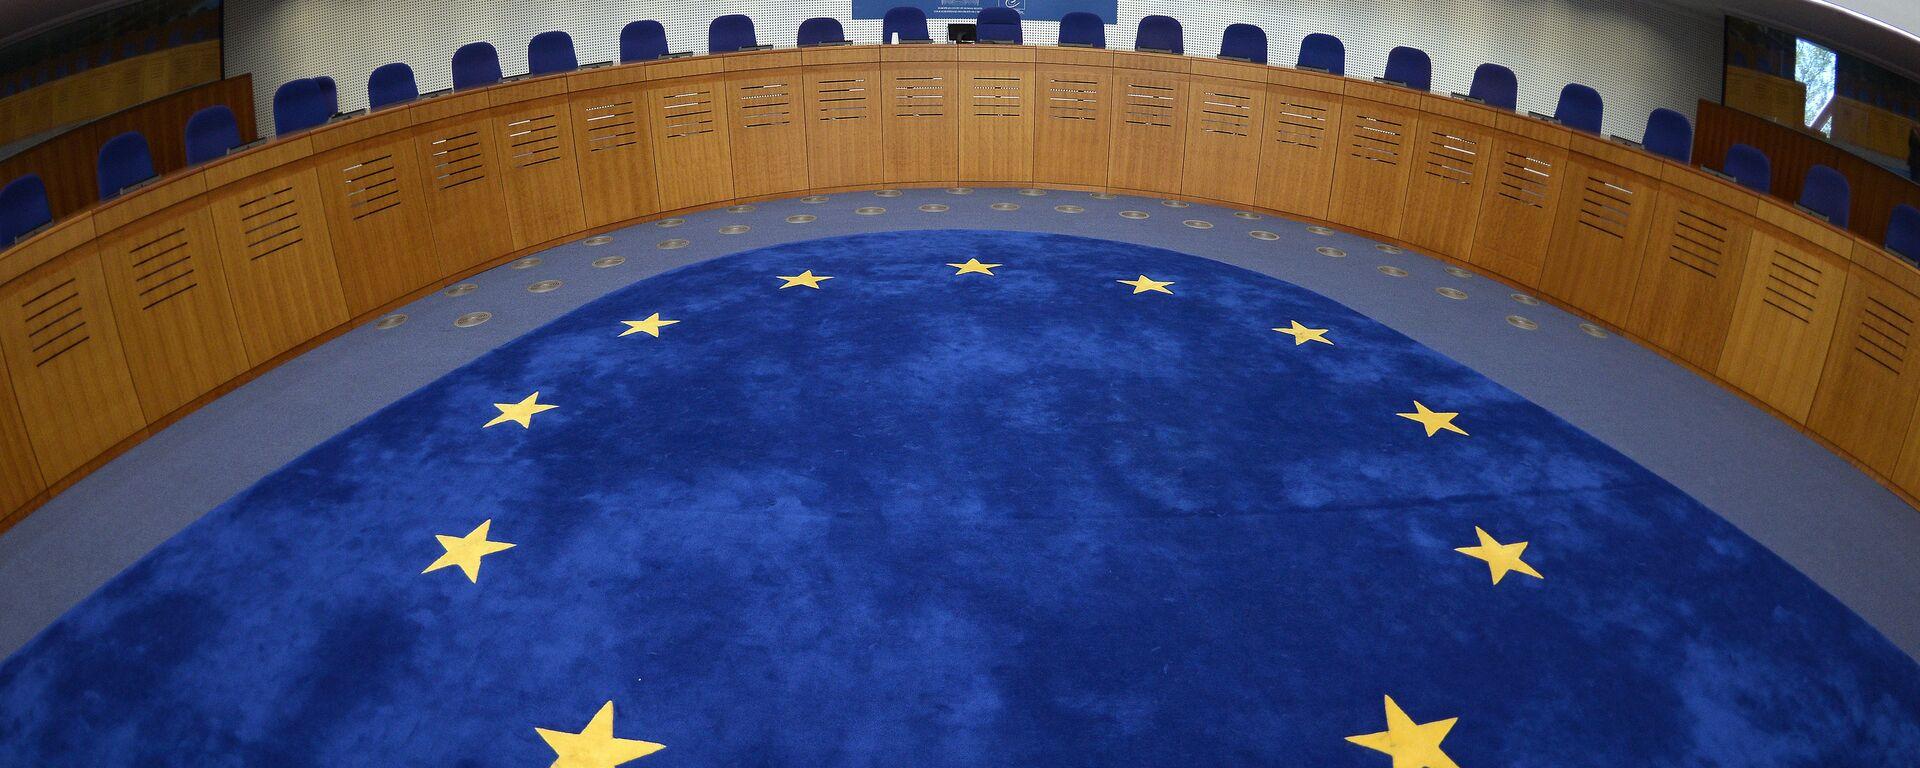 Tribunal Europeo de Derechos Humanos en Estrasburgo - Sputnik Mundo, 1920, 14.01.2021